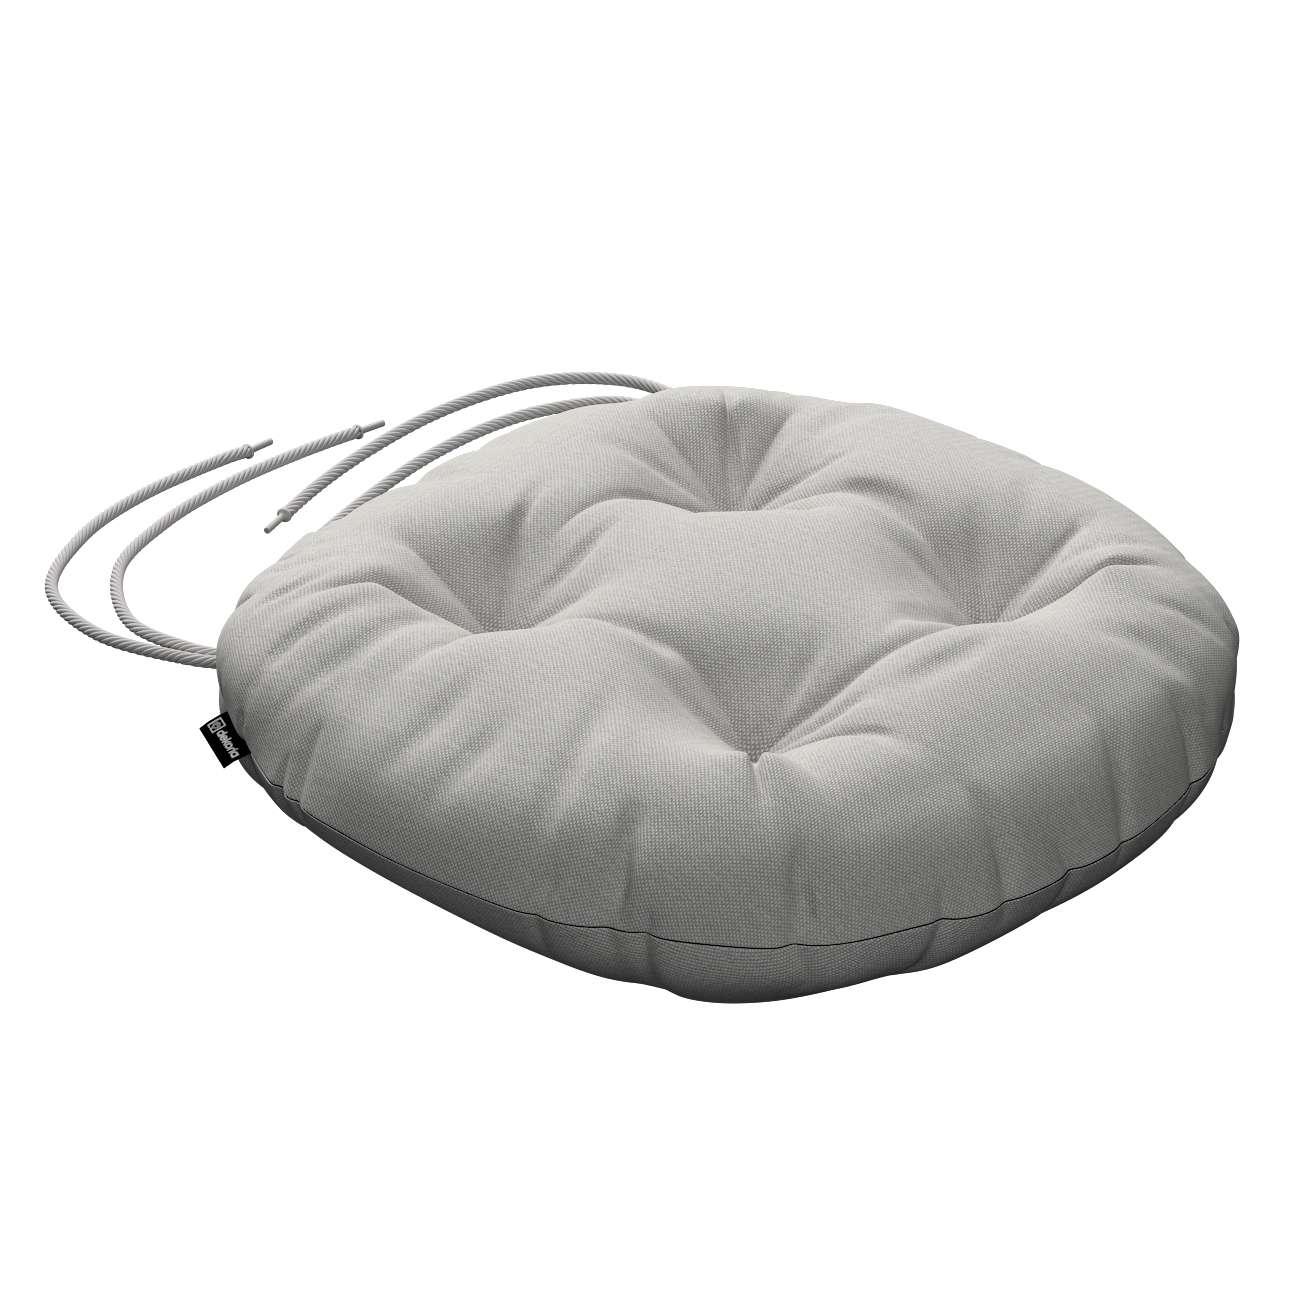 Kėdės pagalvėlė Adam  skersmuo 37x8cm kolekcijoje Etna , audinys: 705-90